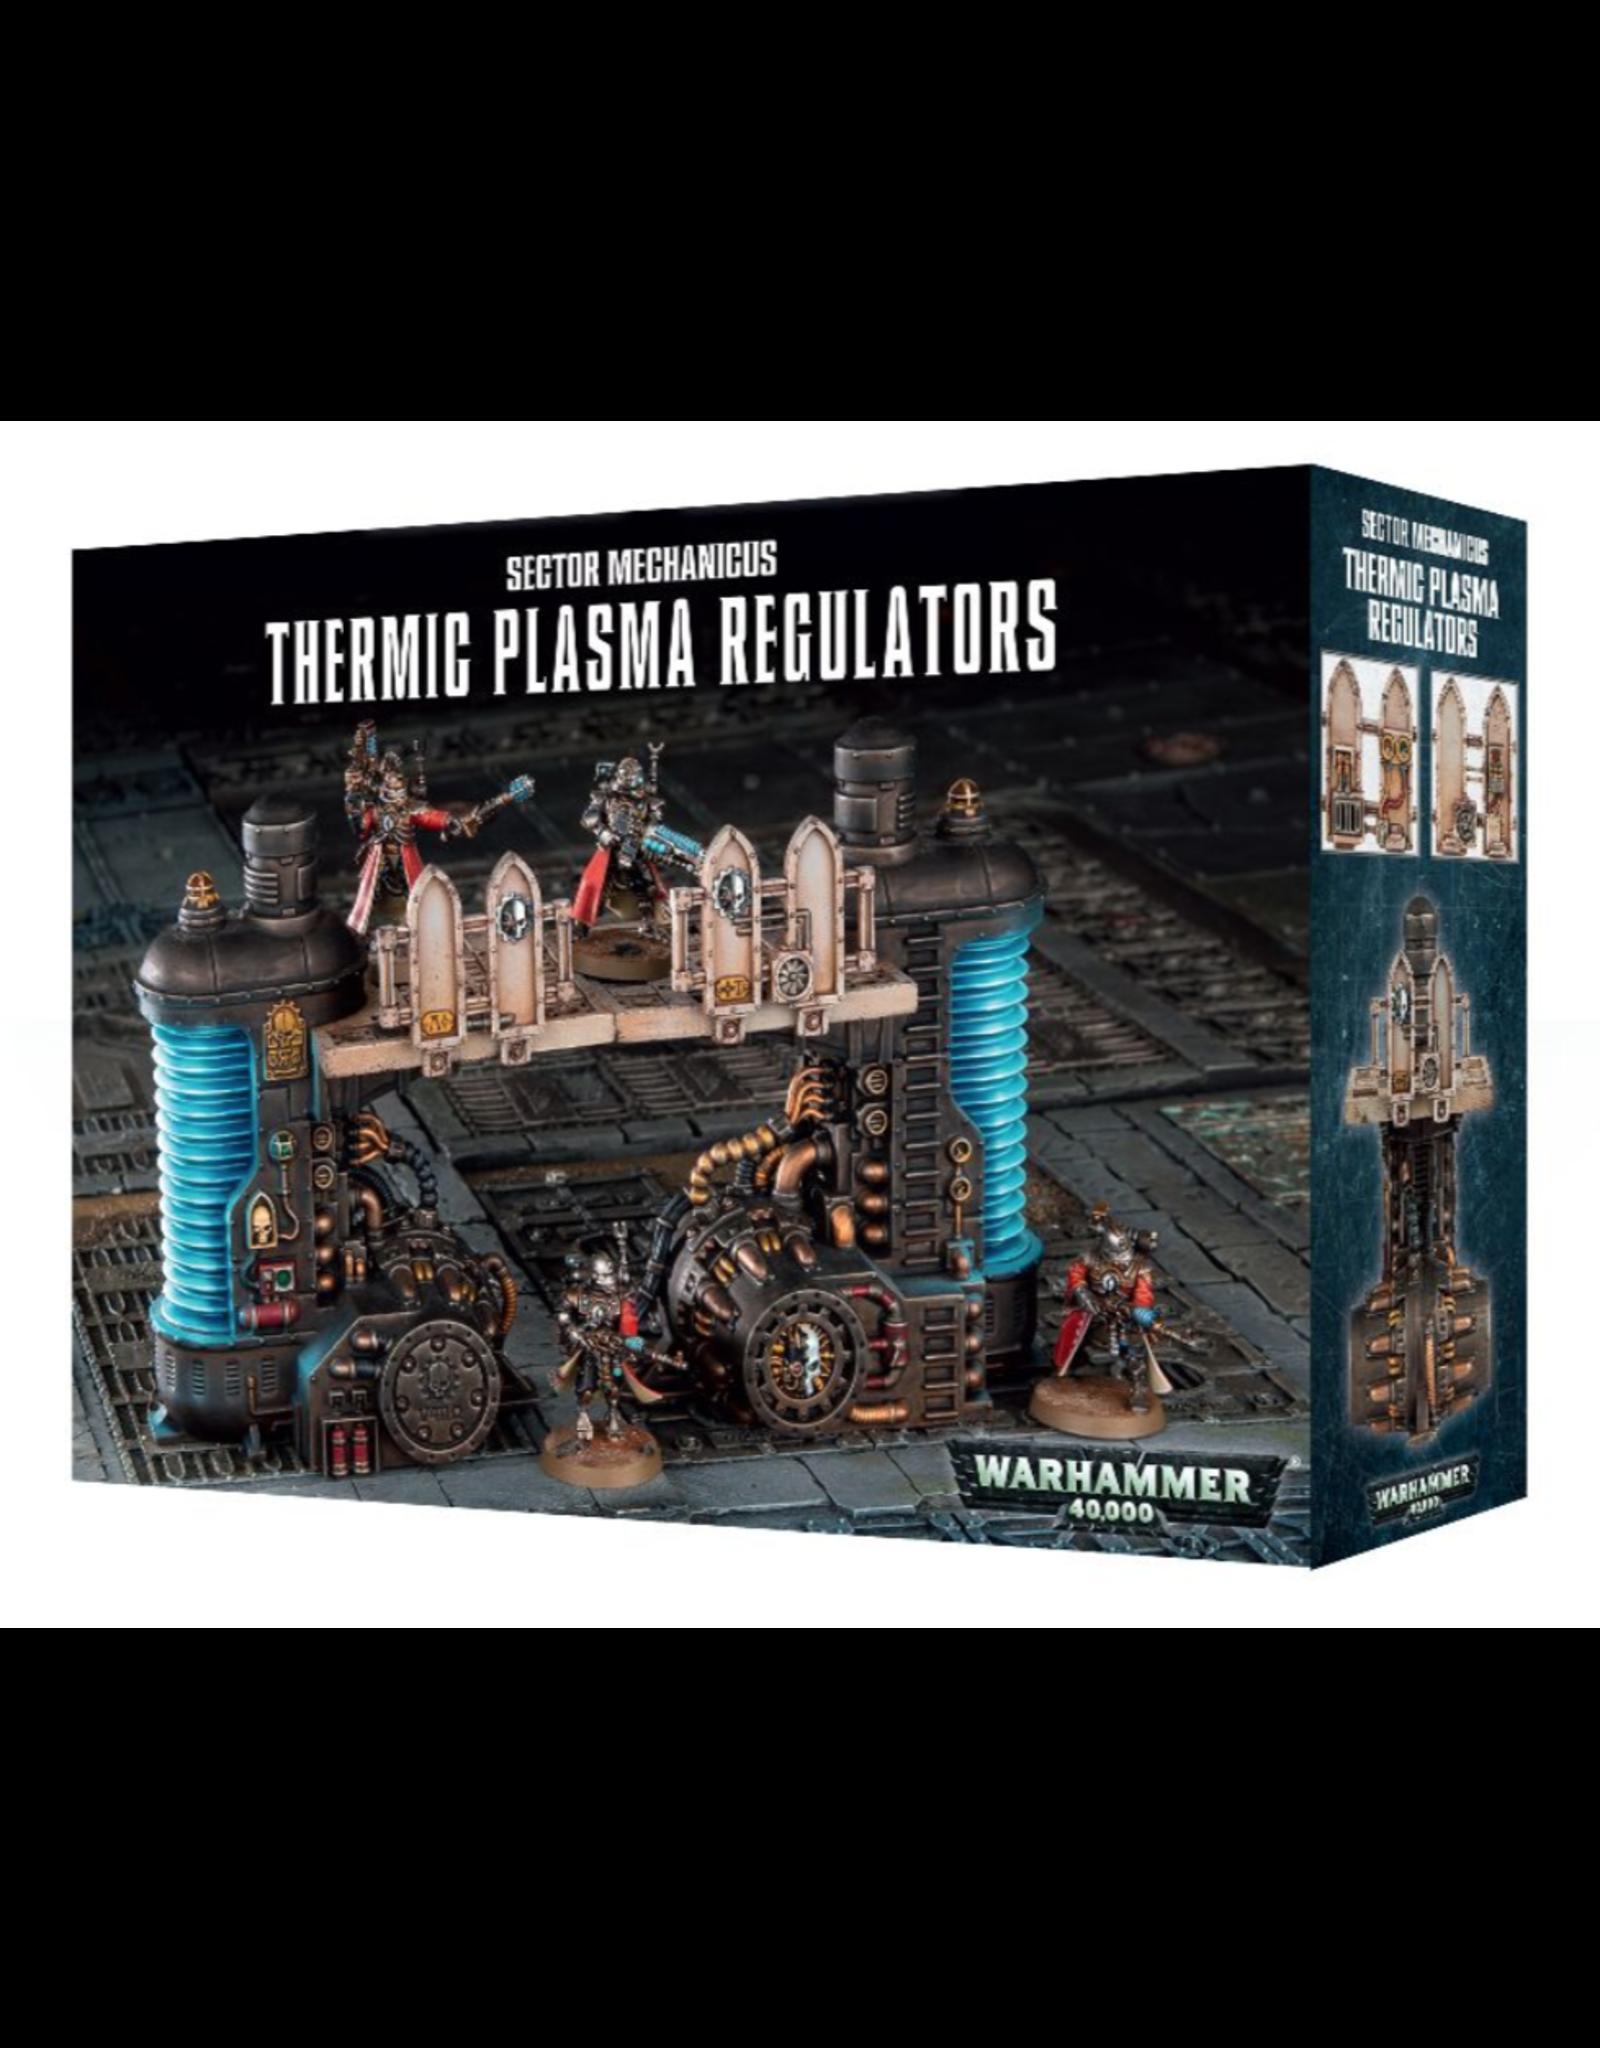 Warhammer 40K Warhammer 40k: Thermic Plasma Regulators